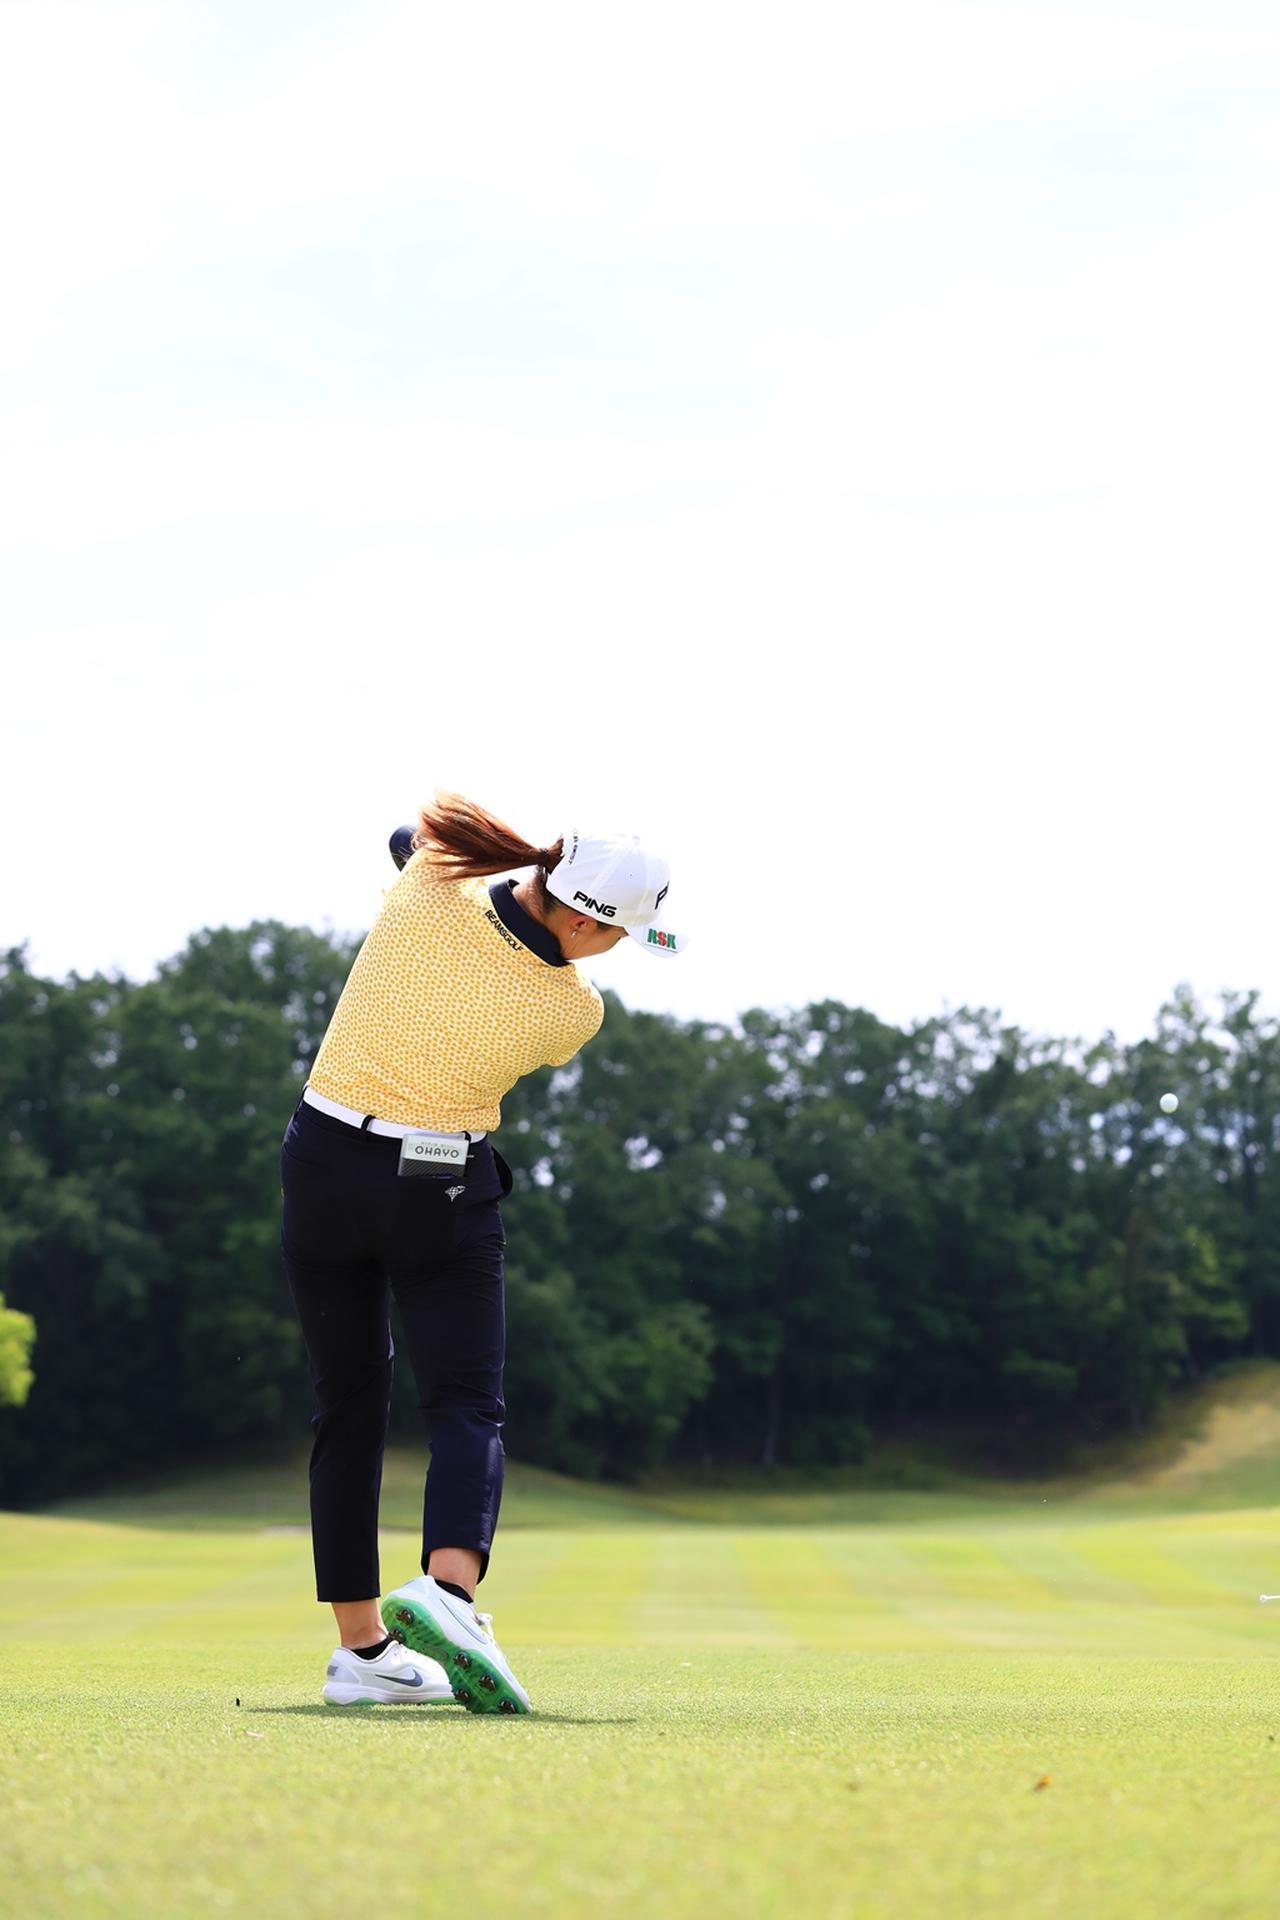 Images : 15番目の画像 - 渋野日向子のドライバー後方連続写真 - みんなのゴルフダイジェスト